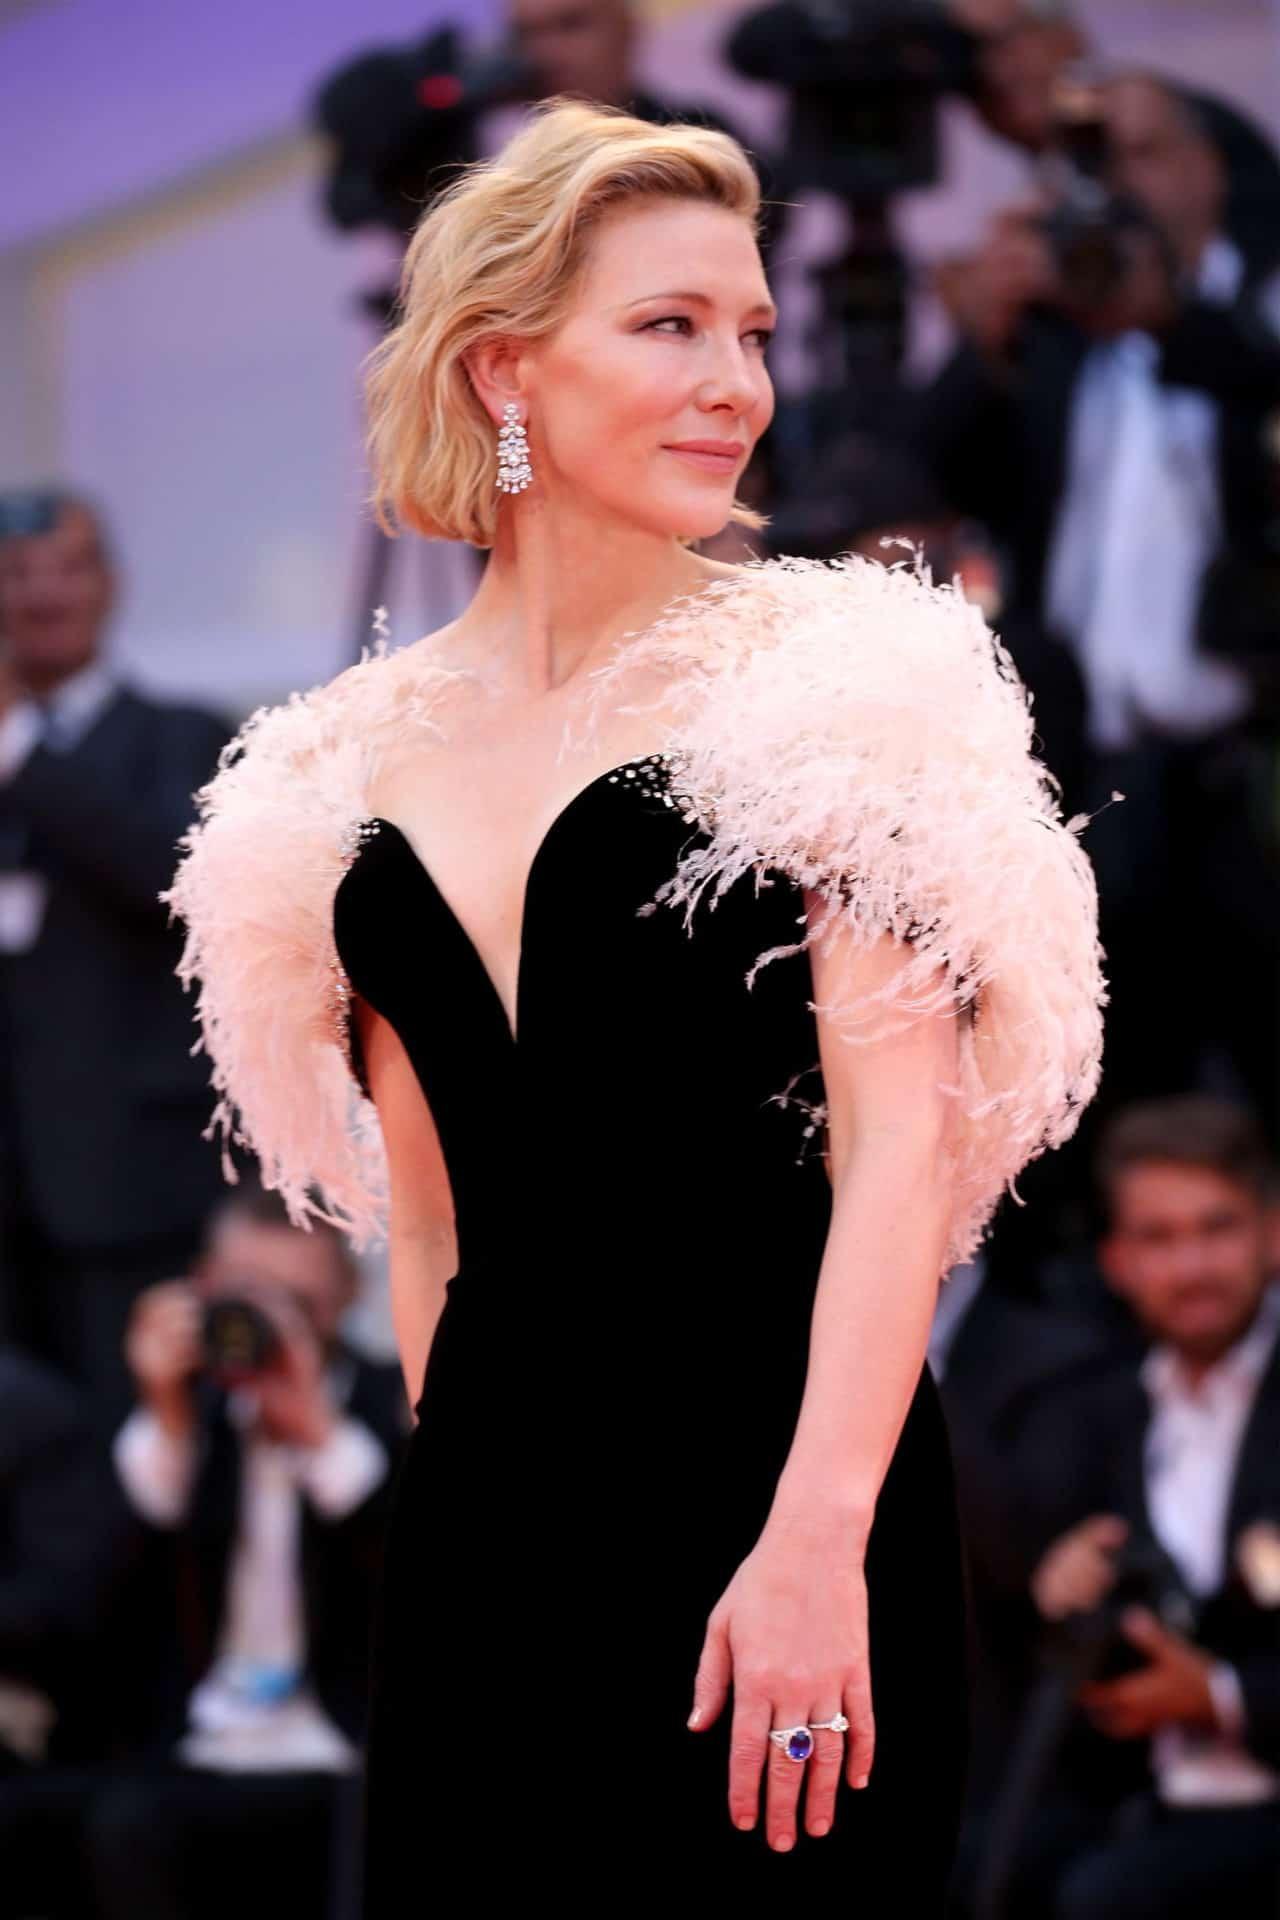 Cate Blanchett in Chopard August 31 2018 3.jpeg